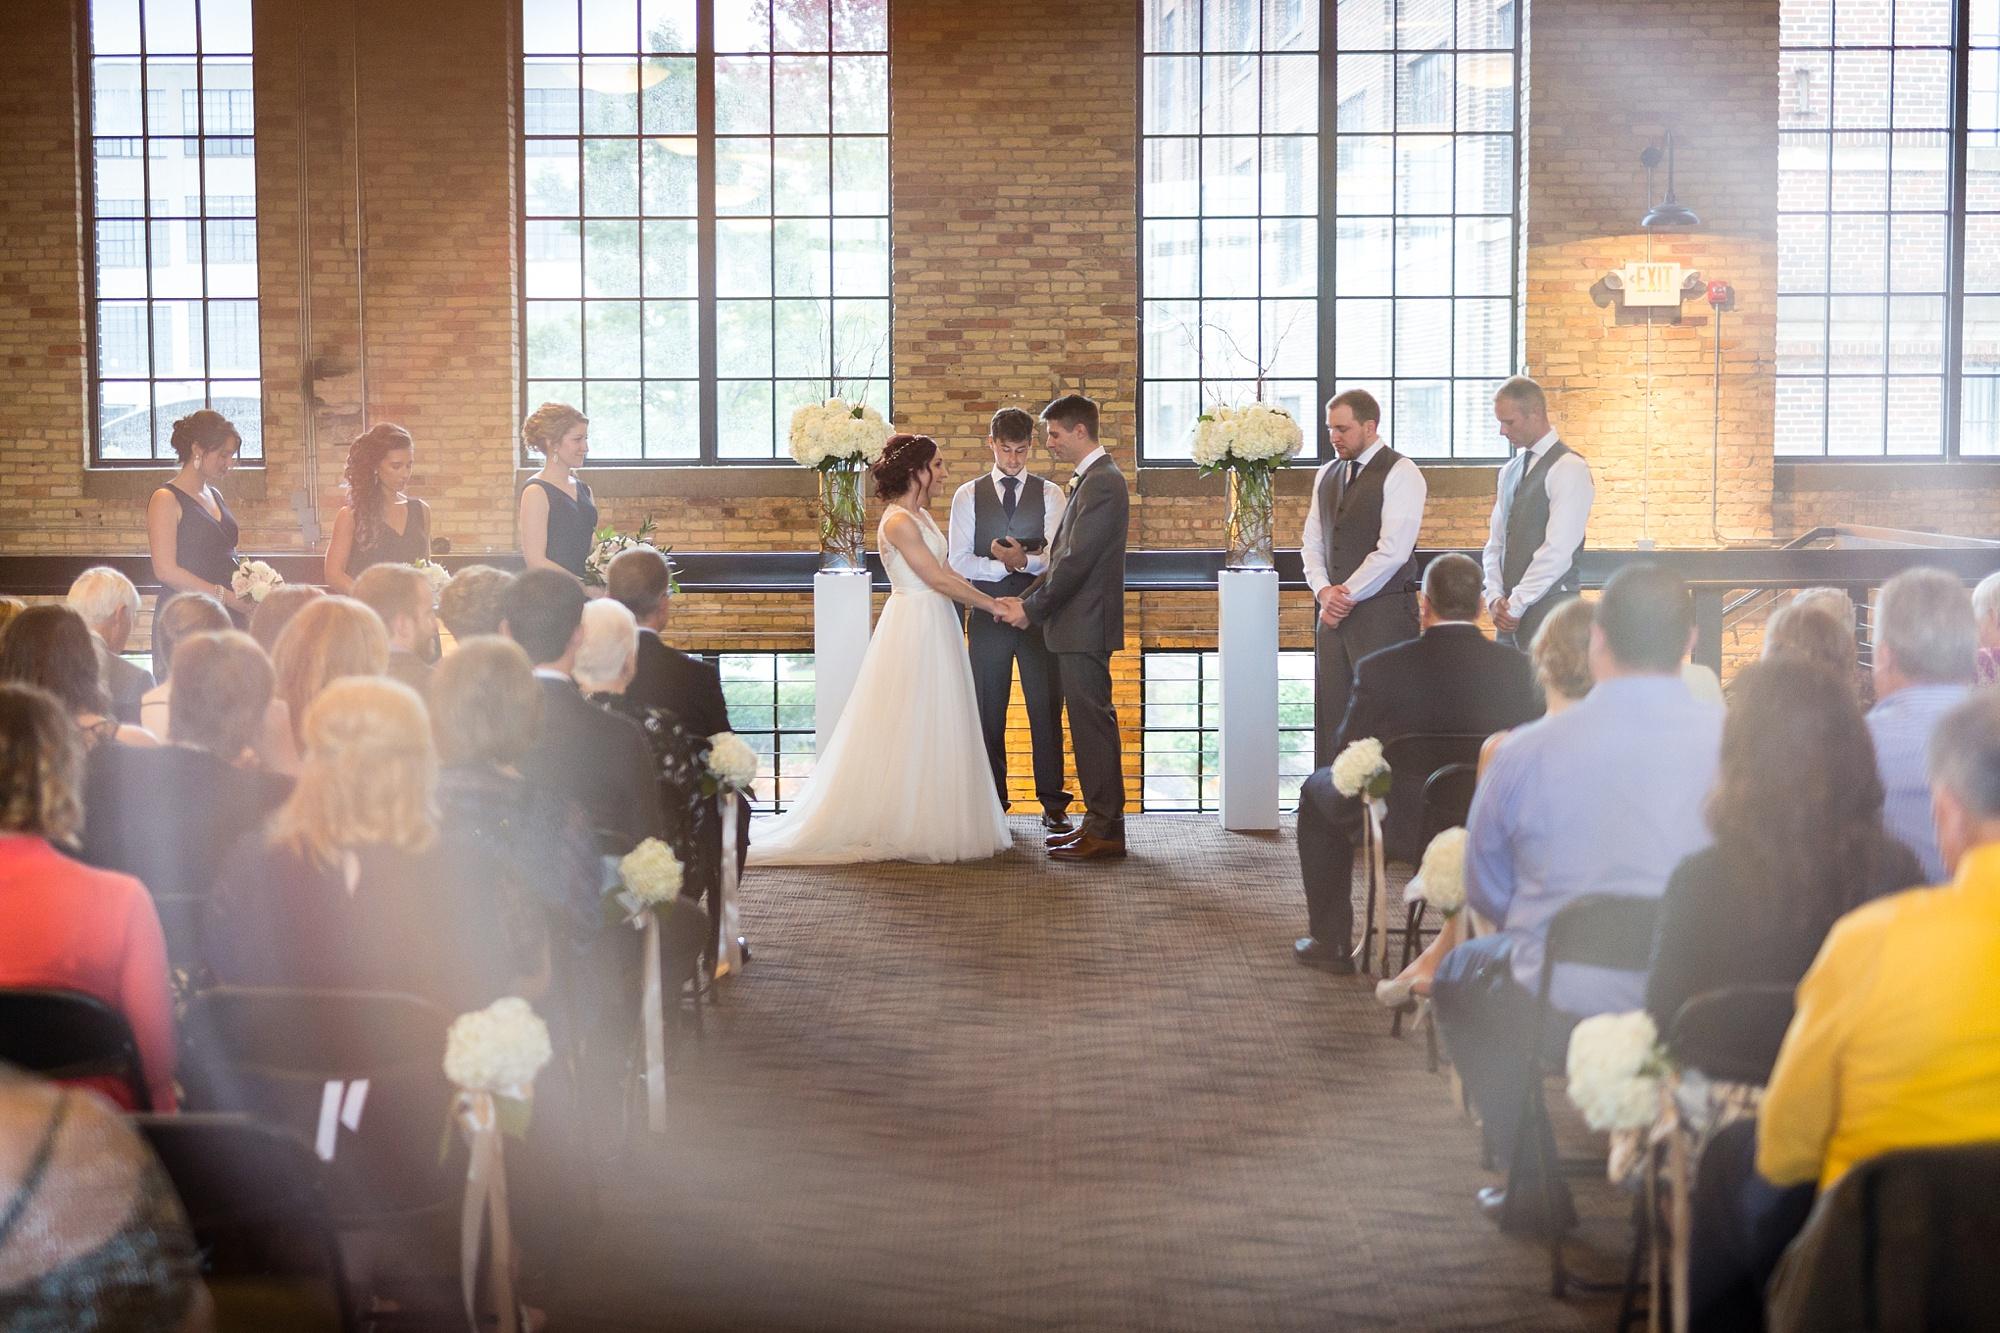 Brandon_Shafer_Photography_Lauren_Ethan_New_Vintage_Place_Grand_Rapids_Wedding_0036.jpg